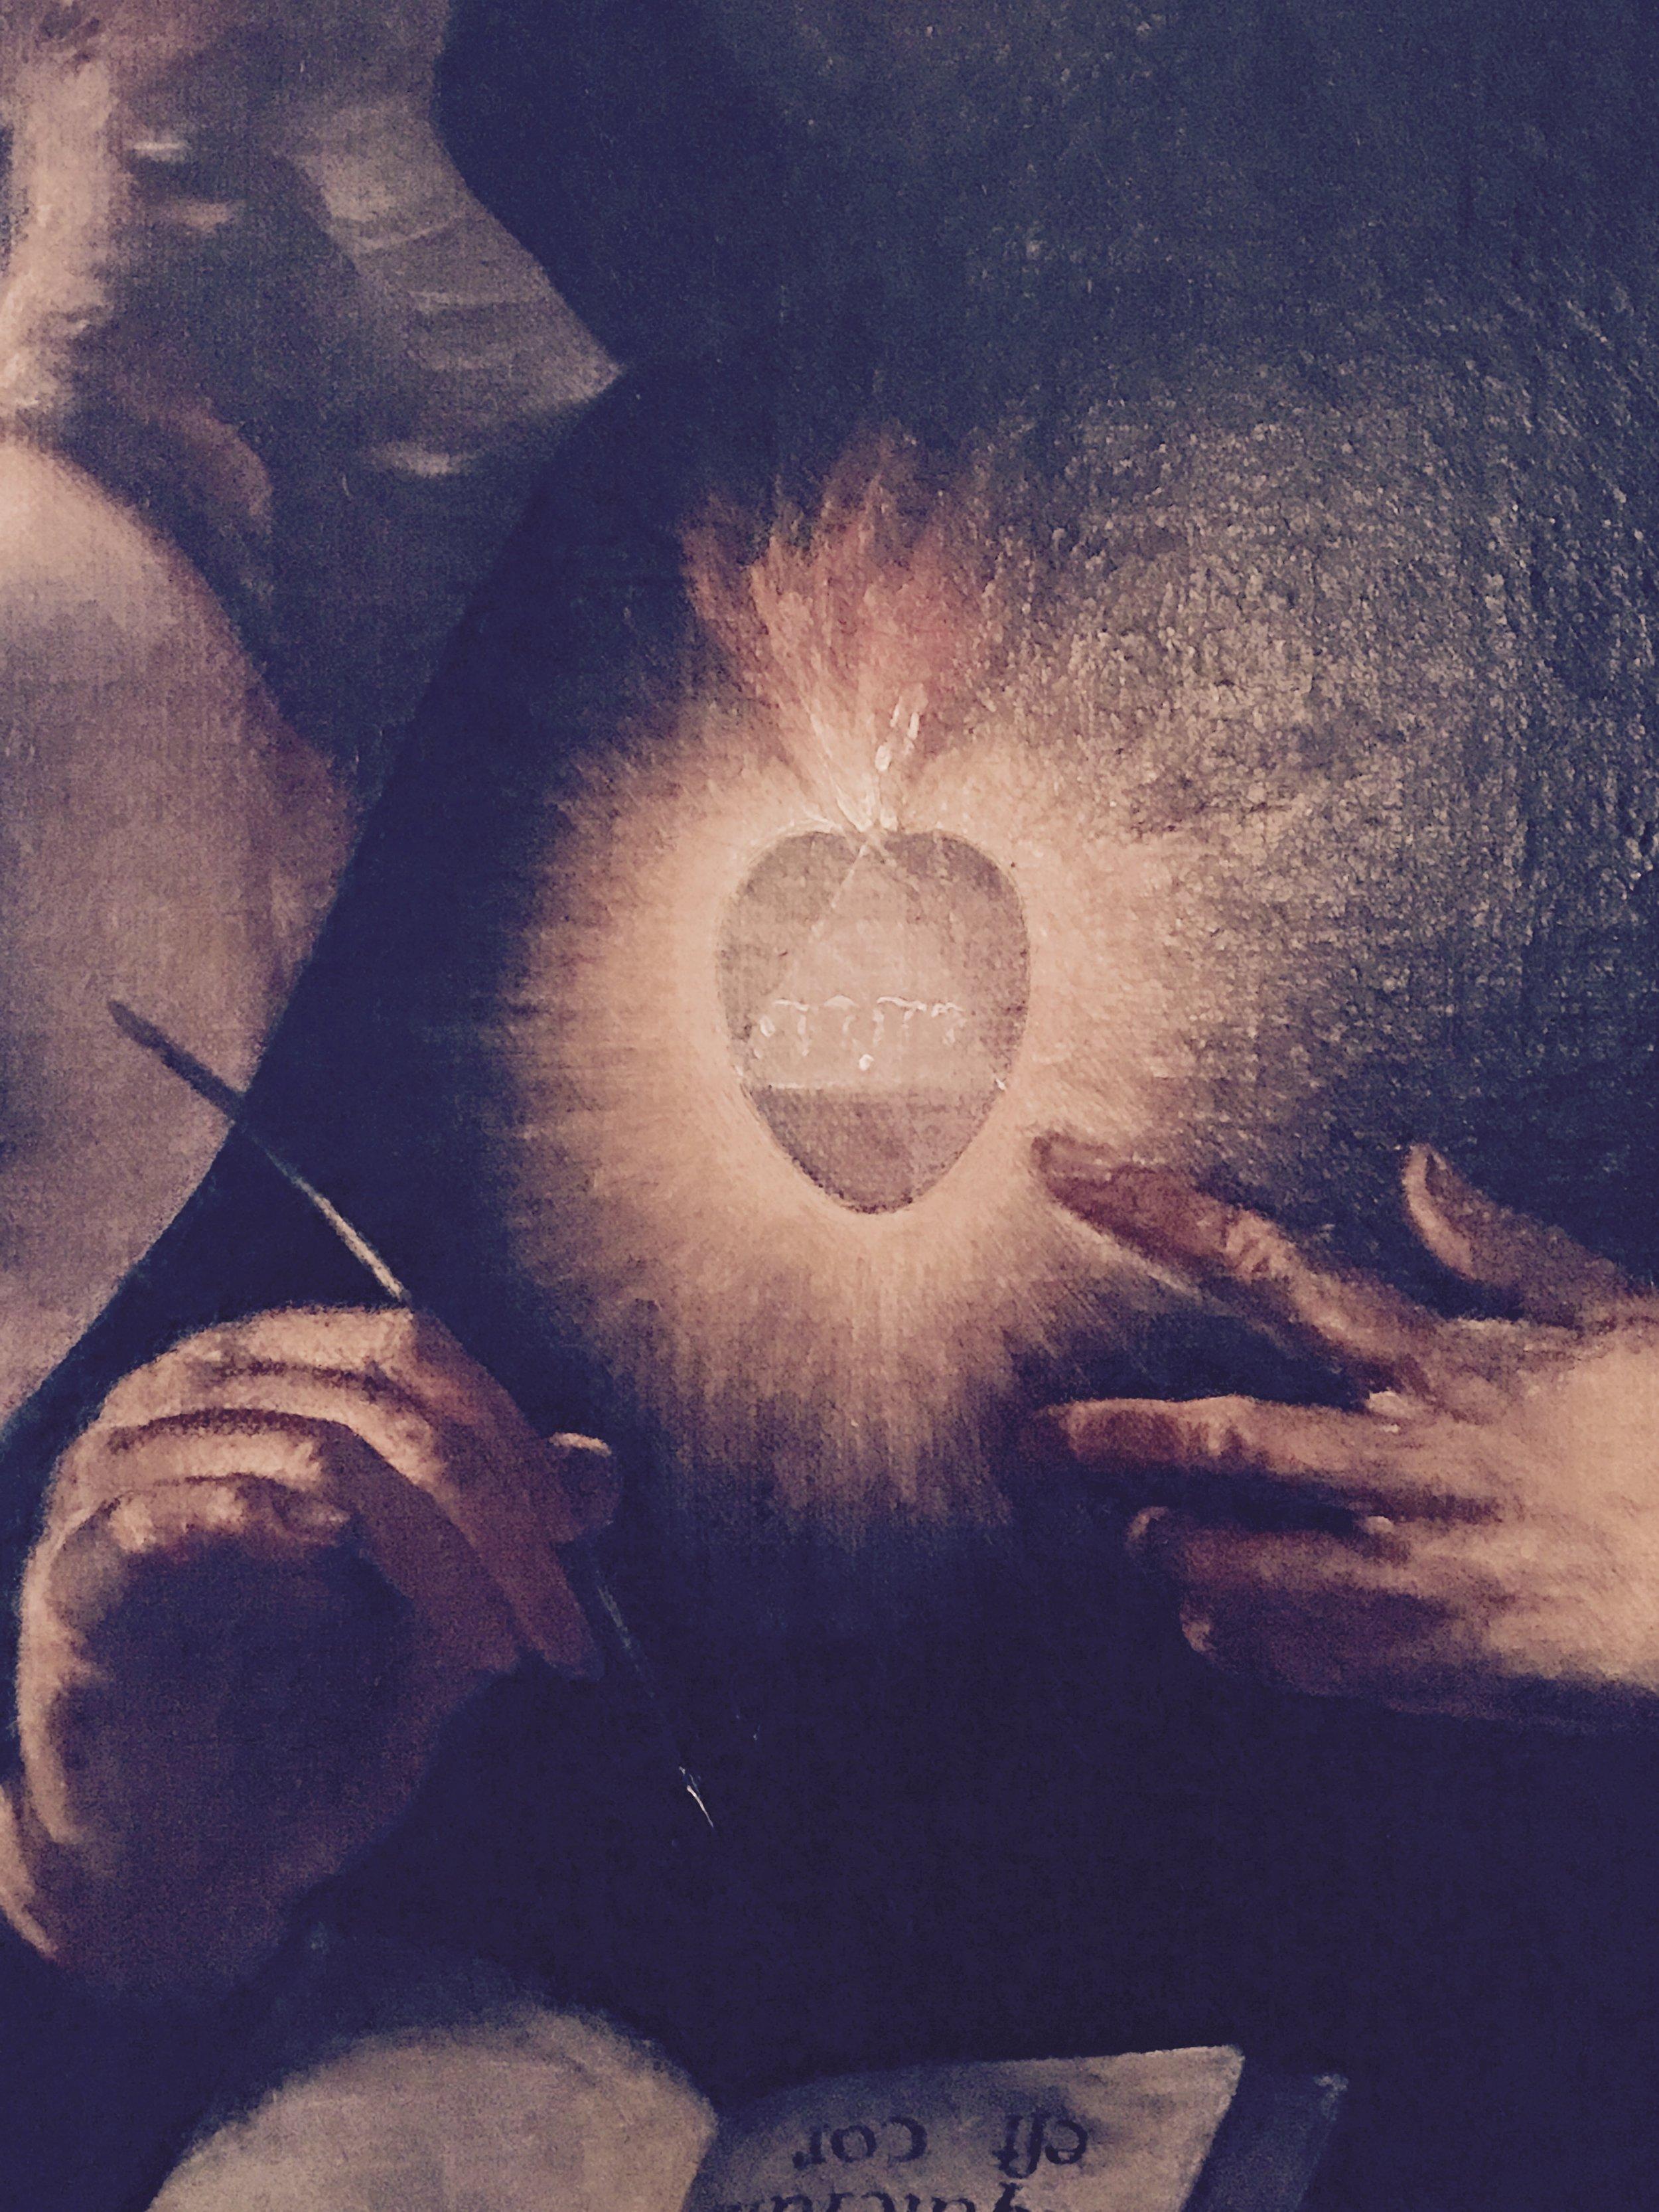 A flaming heart with the Tetragrammaton